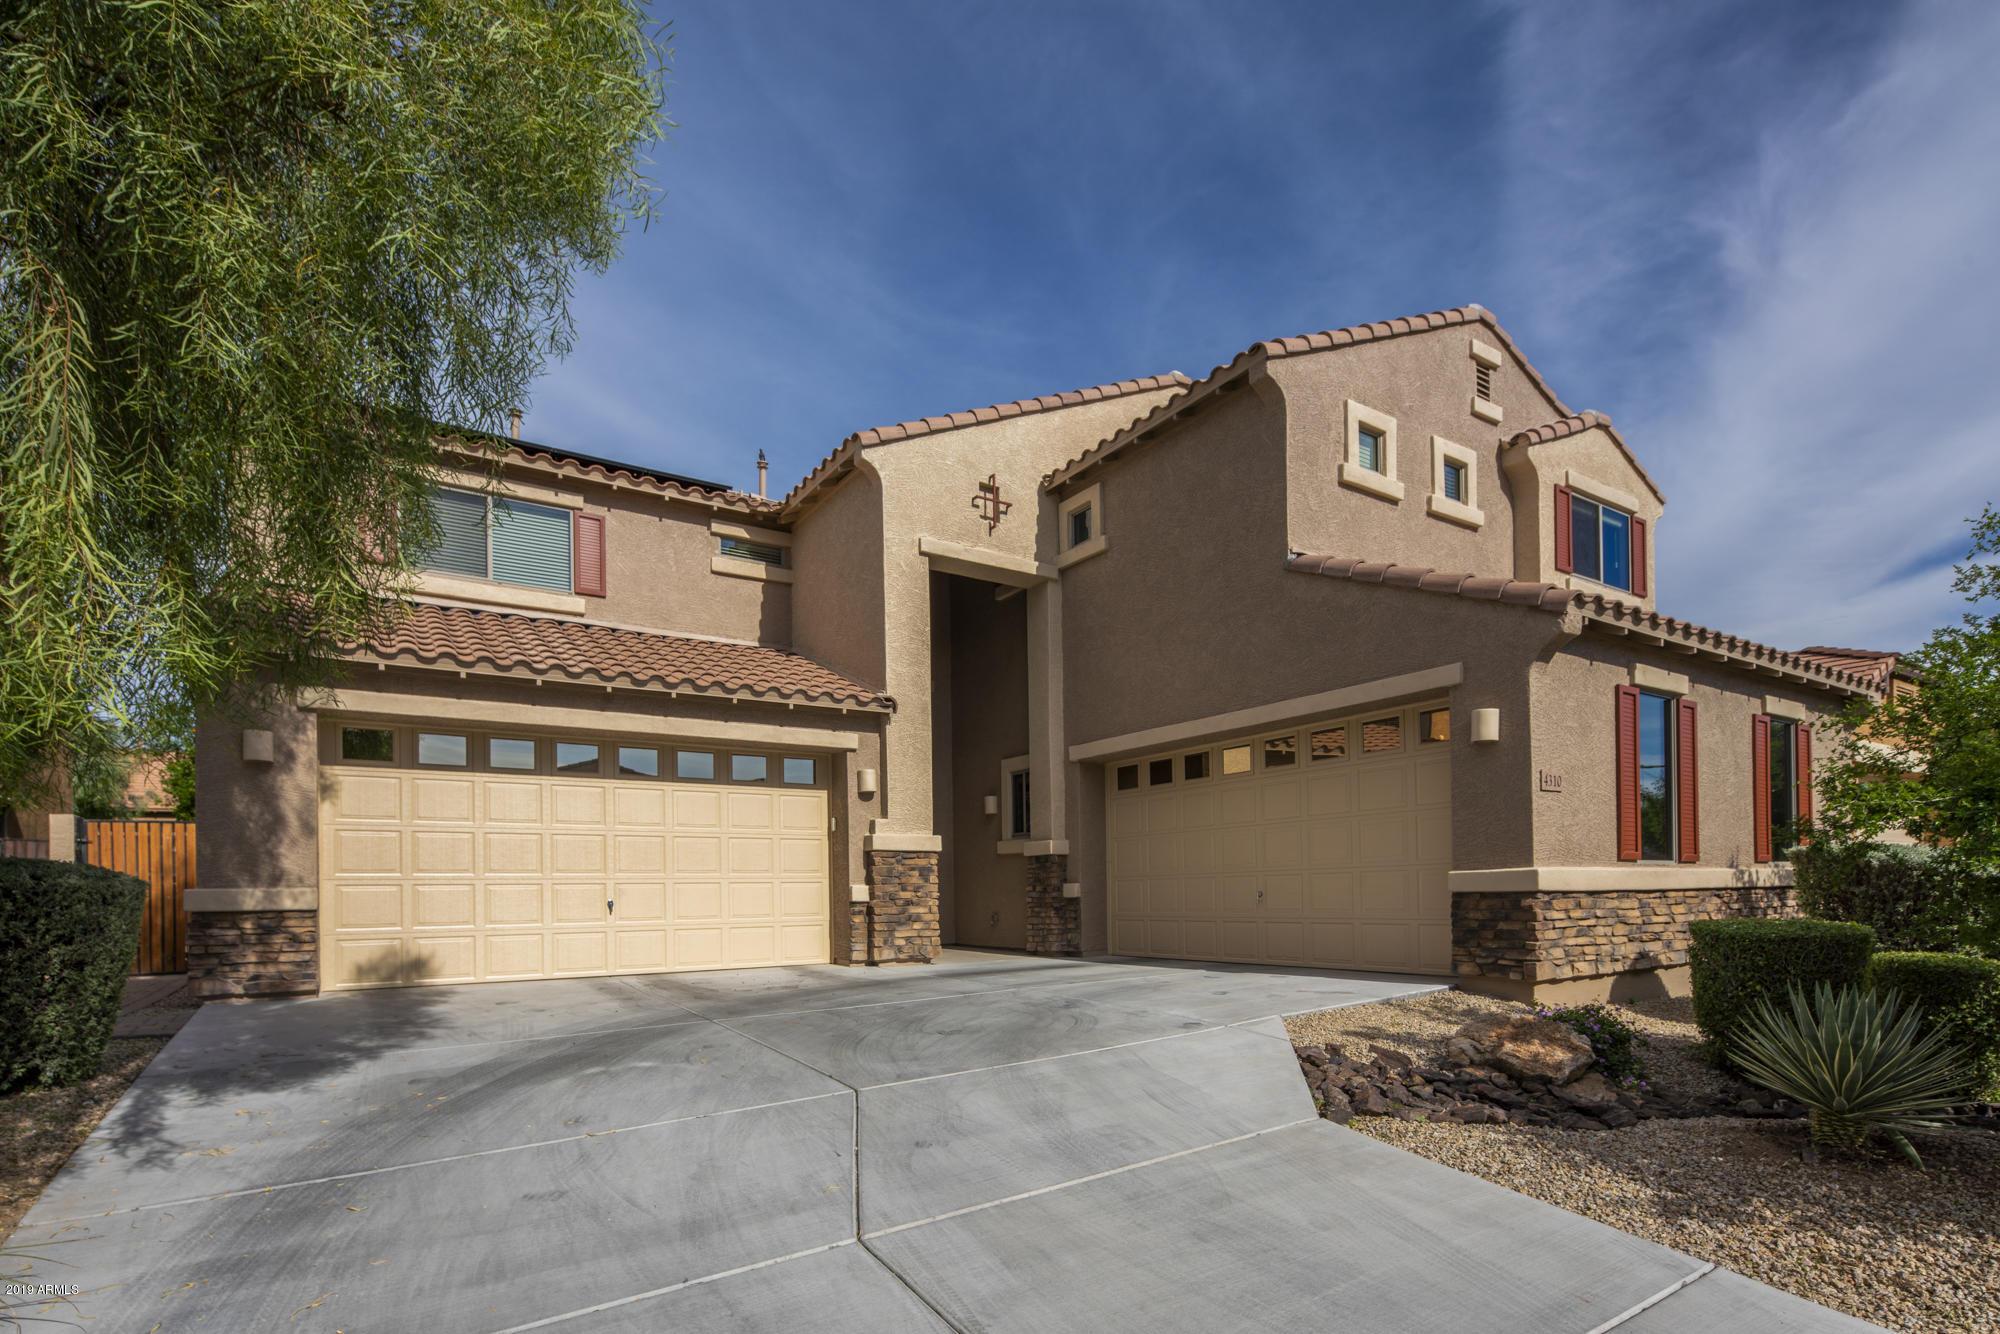 Photo of 4310 E HASHKNIFE Road, Phoenix, AZ 85050